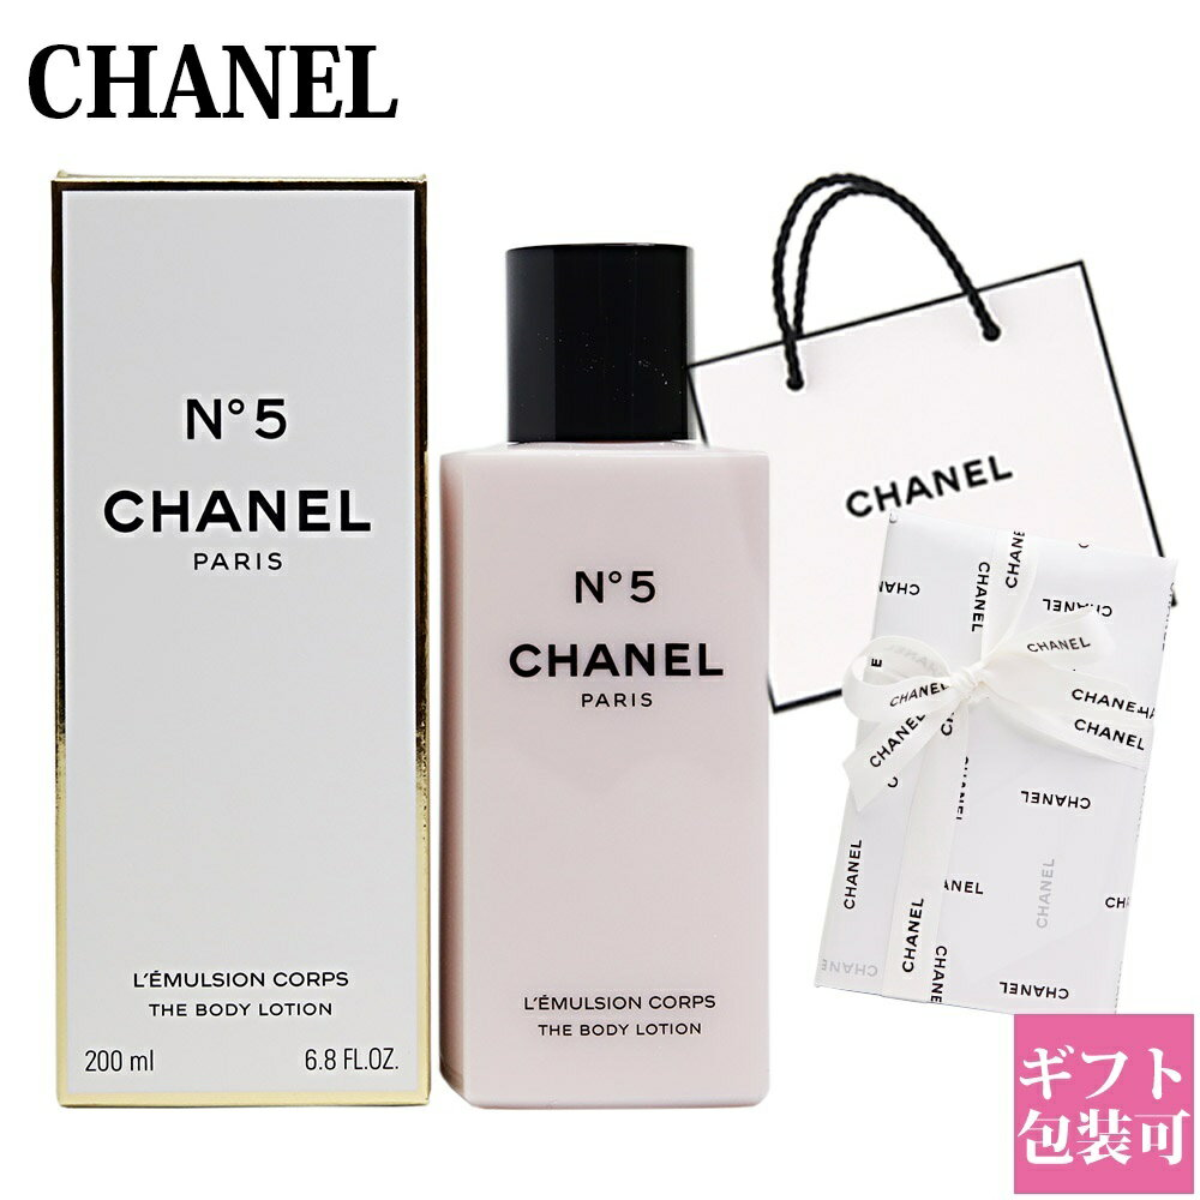 CHANEL 乳液 No5 no,5 200ml CHANEL N5 2021